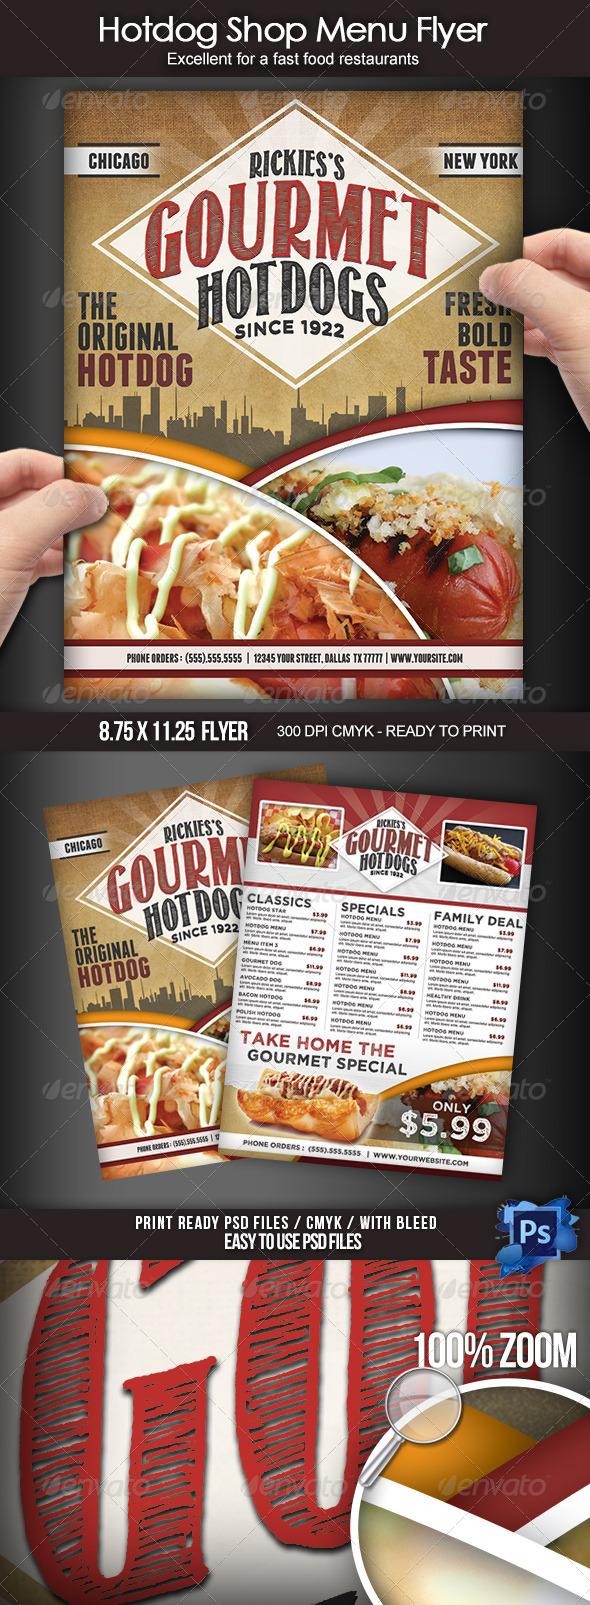 sandwich shop menu template - design poster retro hotdog psd